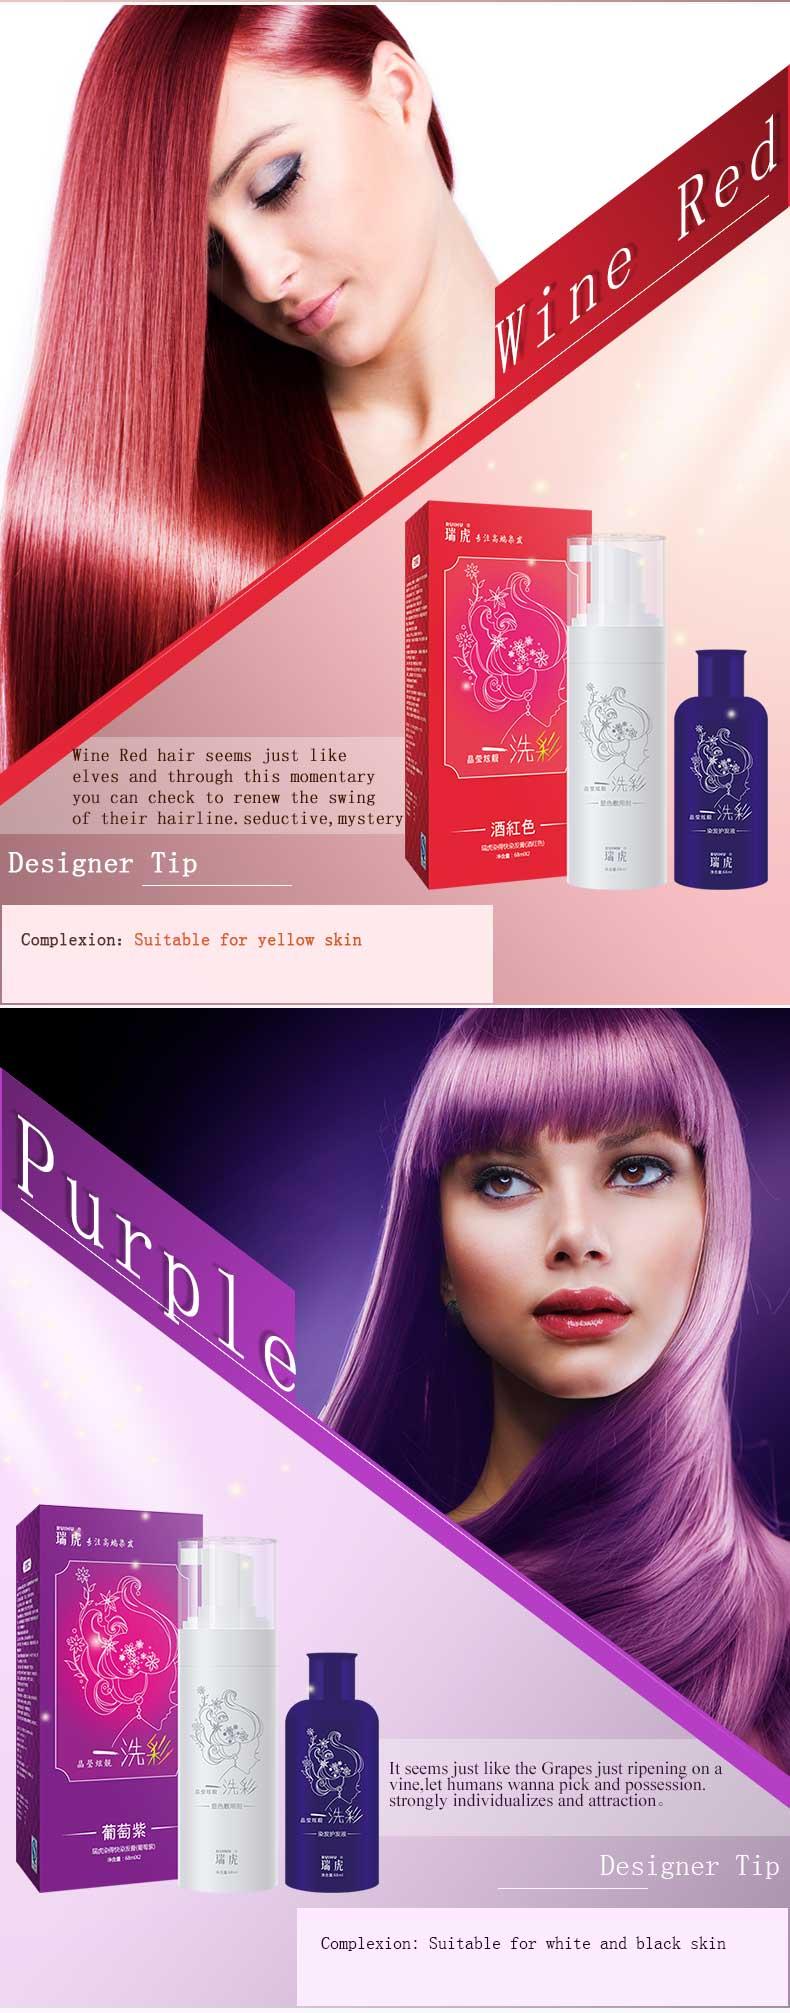 White Hair Color Dye Manufacturer Like Manic Panic Hair Dye Buy